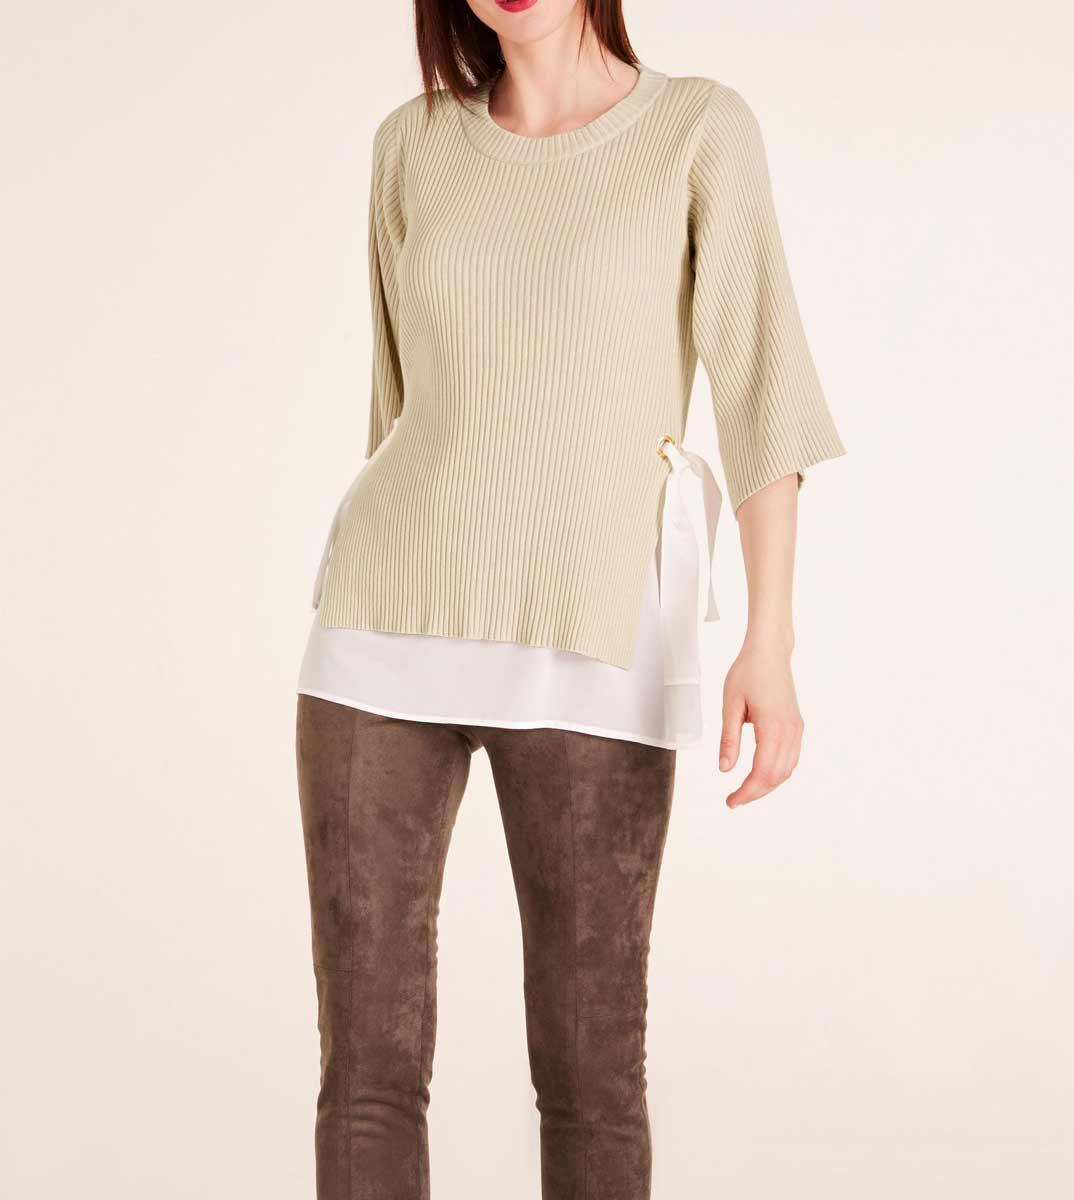 562.443 ASHLEY BROOKE Damen Designer-Pullover-2-in-1 Beige-Ecru Chiffon Top Rippenstrick